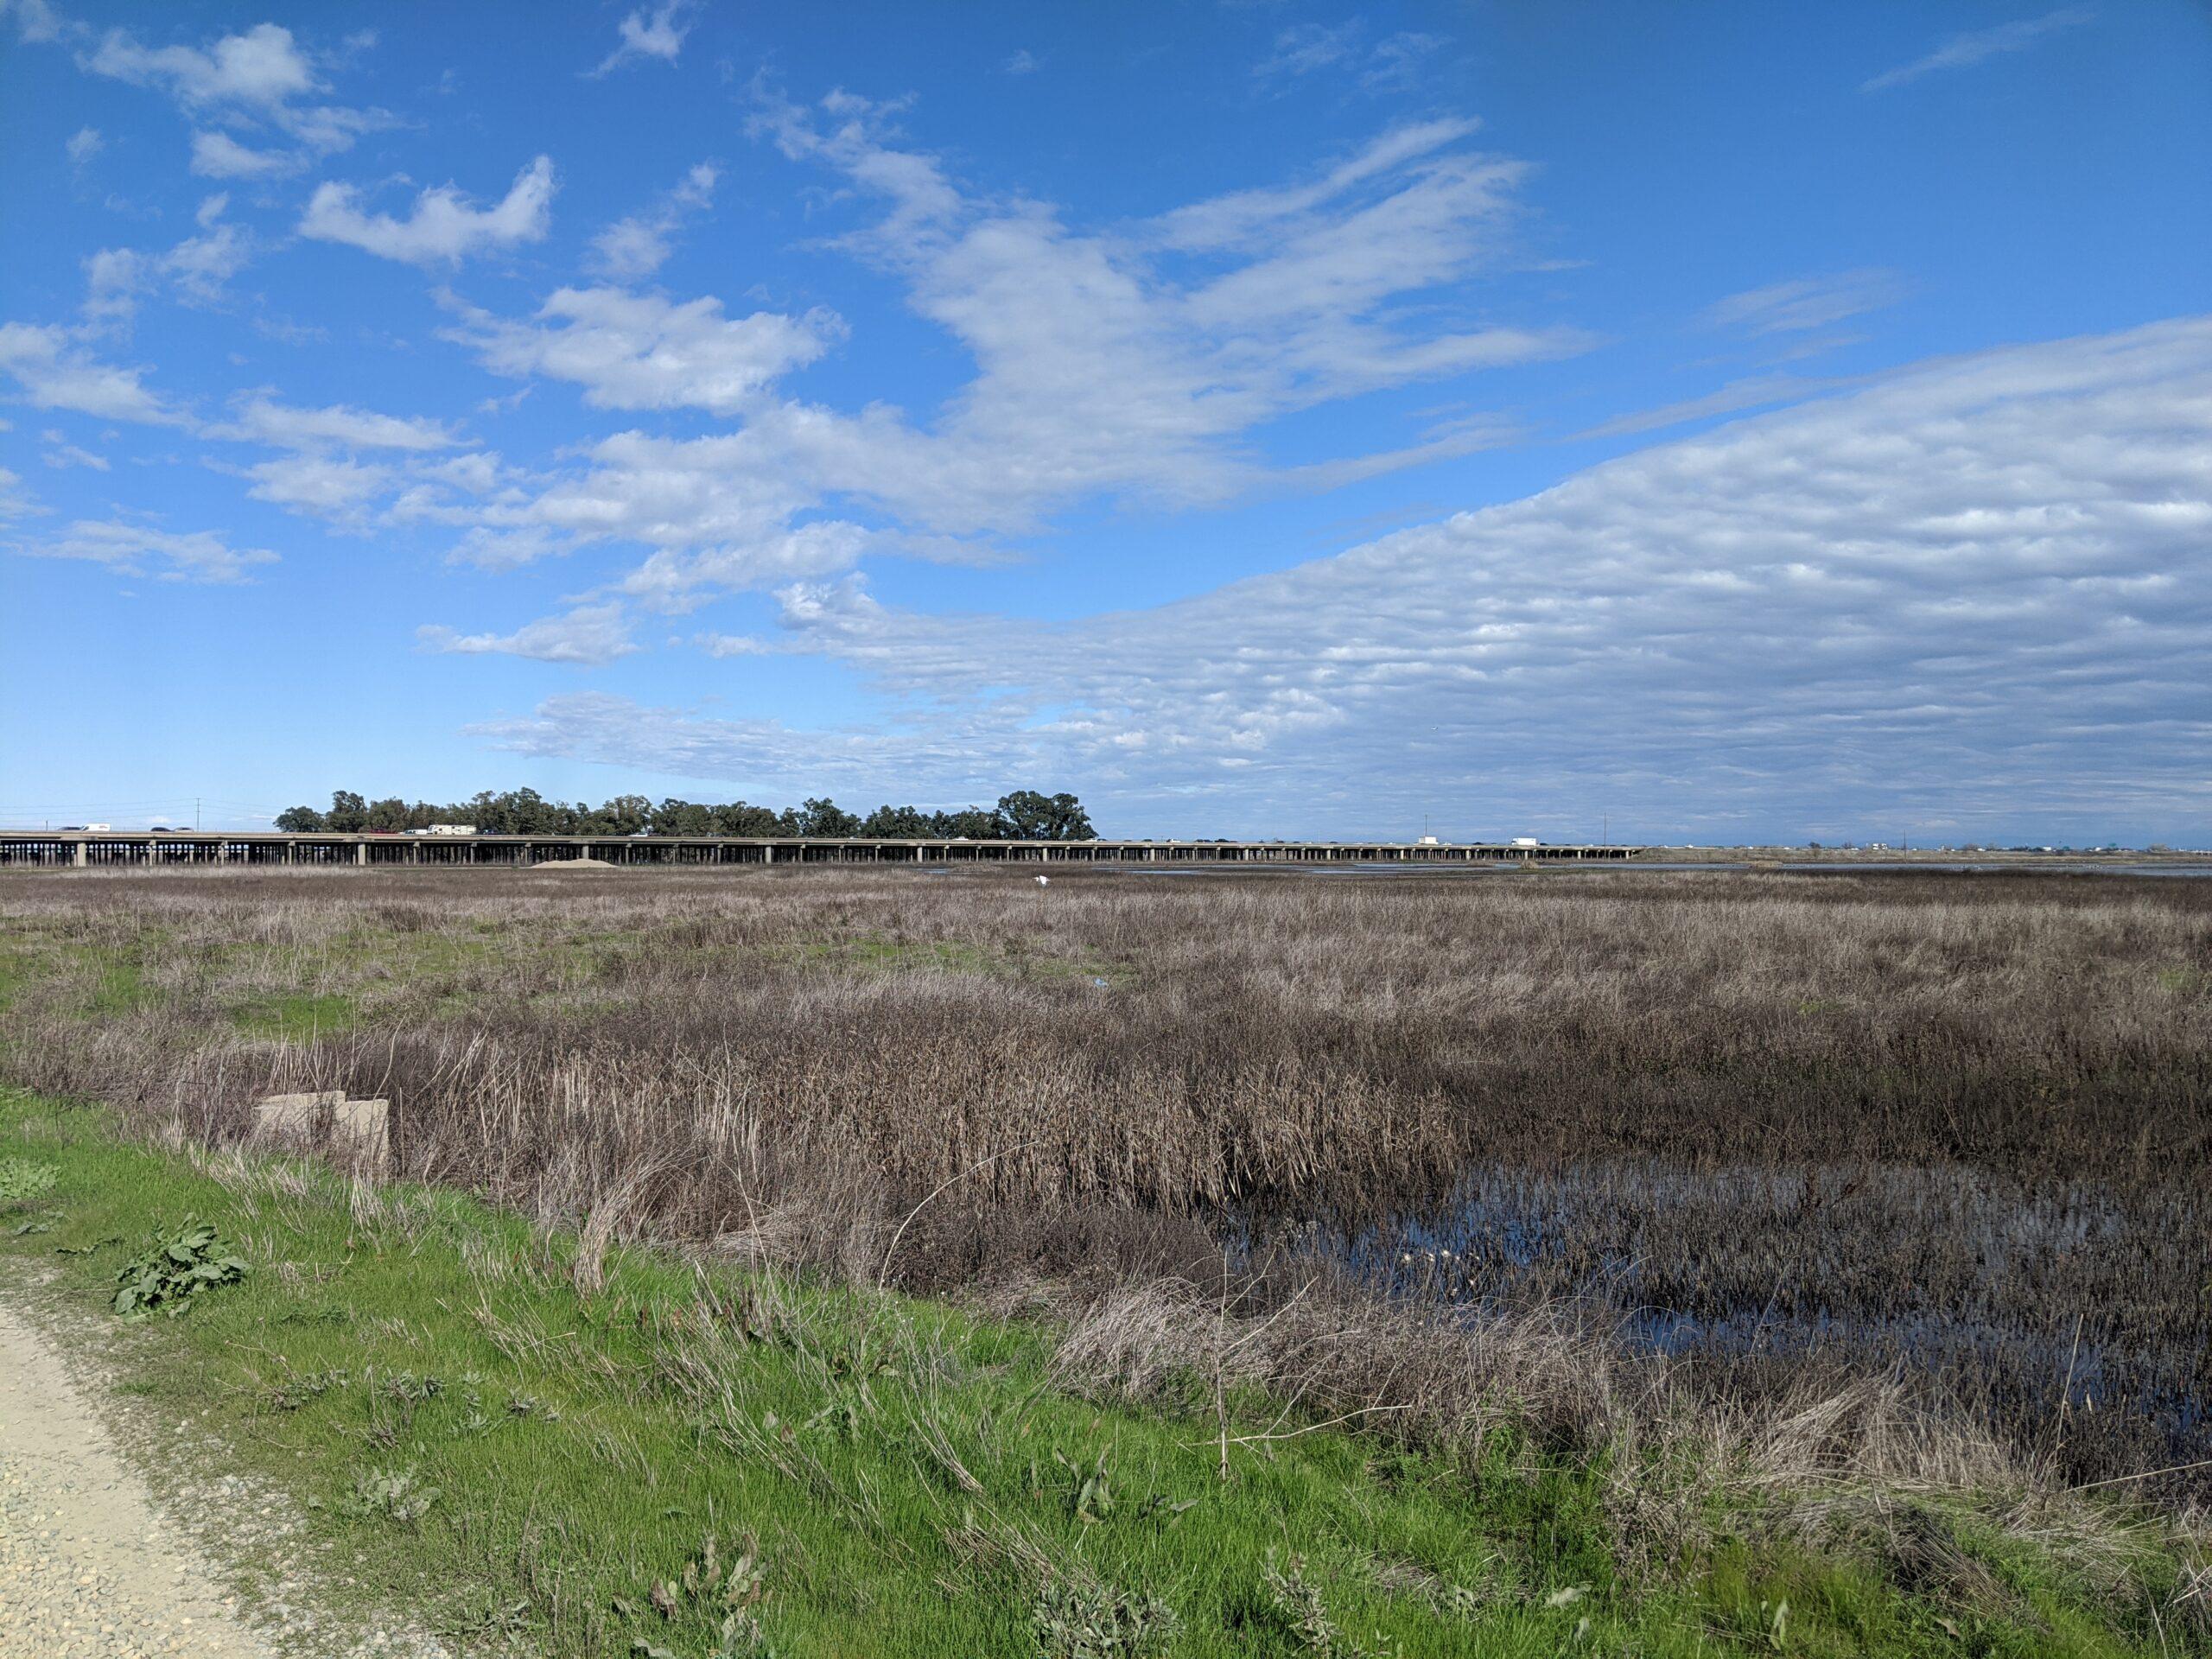 Yolo Bypass Wildlife Area and I-80